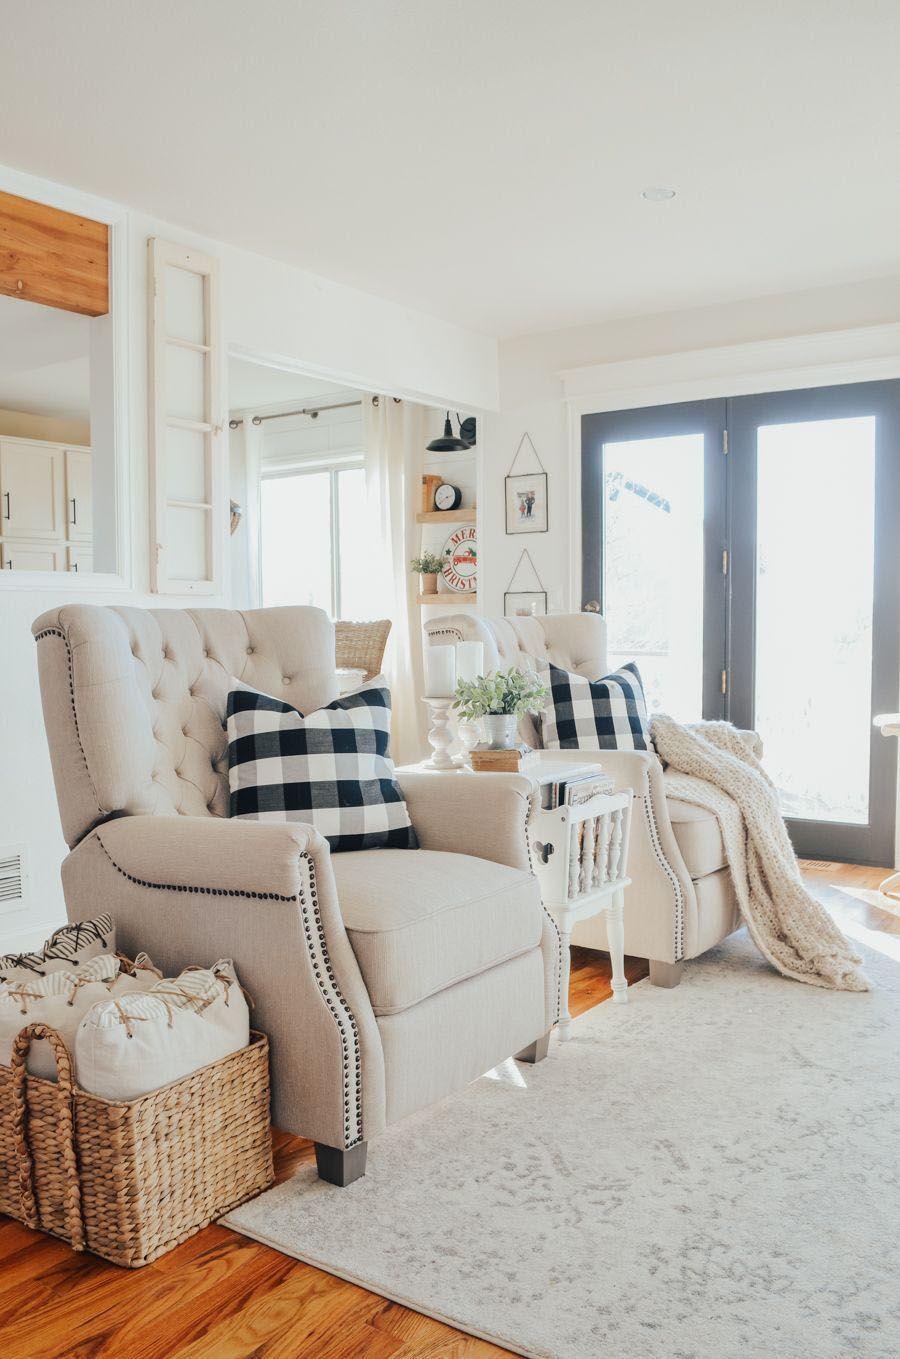 Amazing living room sets tulsa ok one and only interioropedia.com